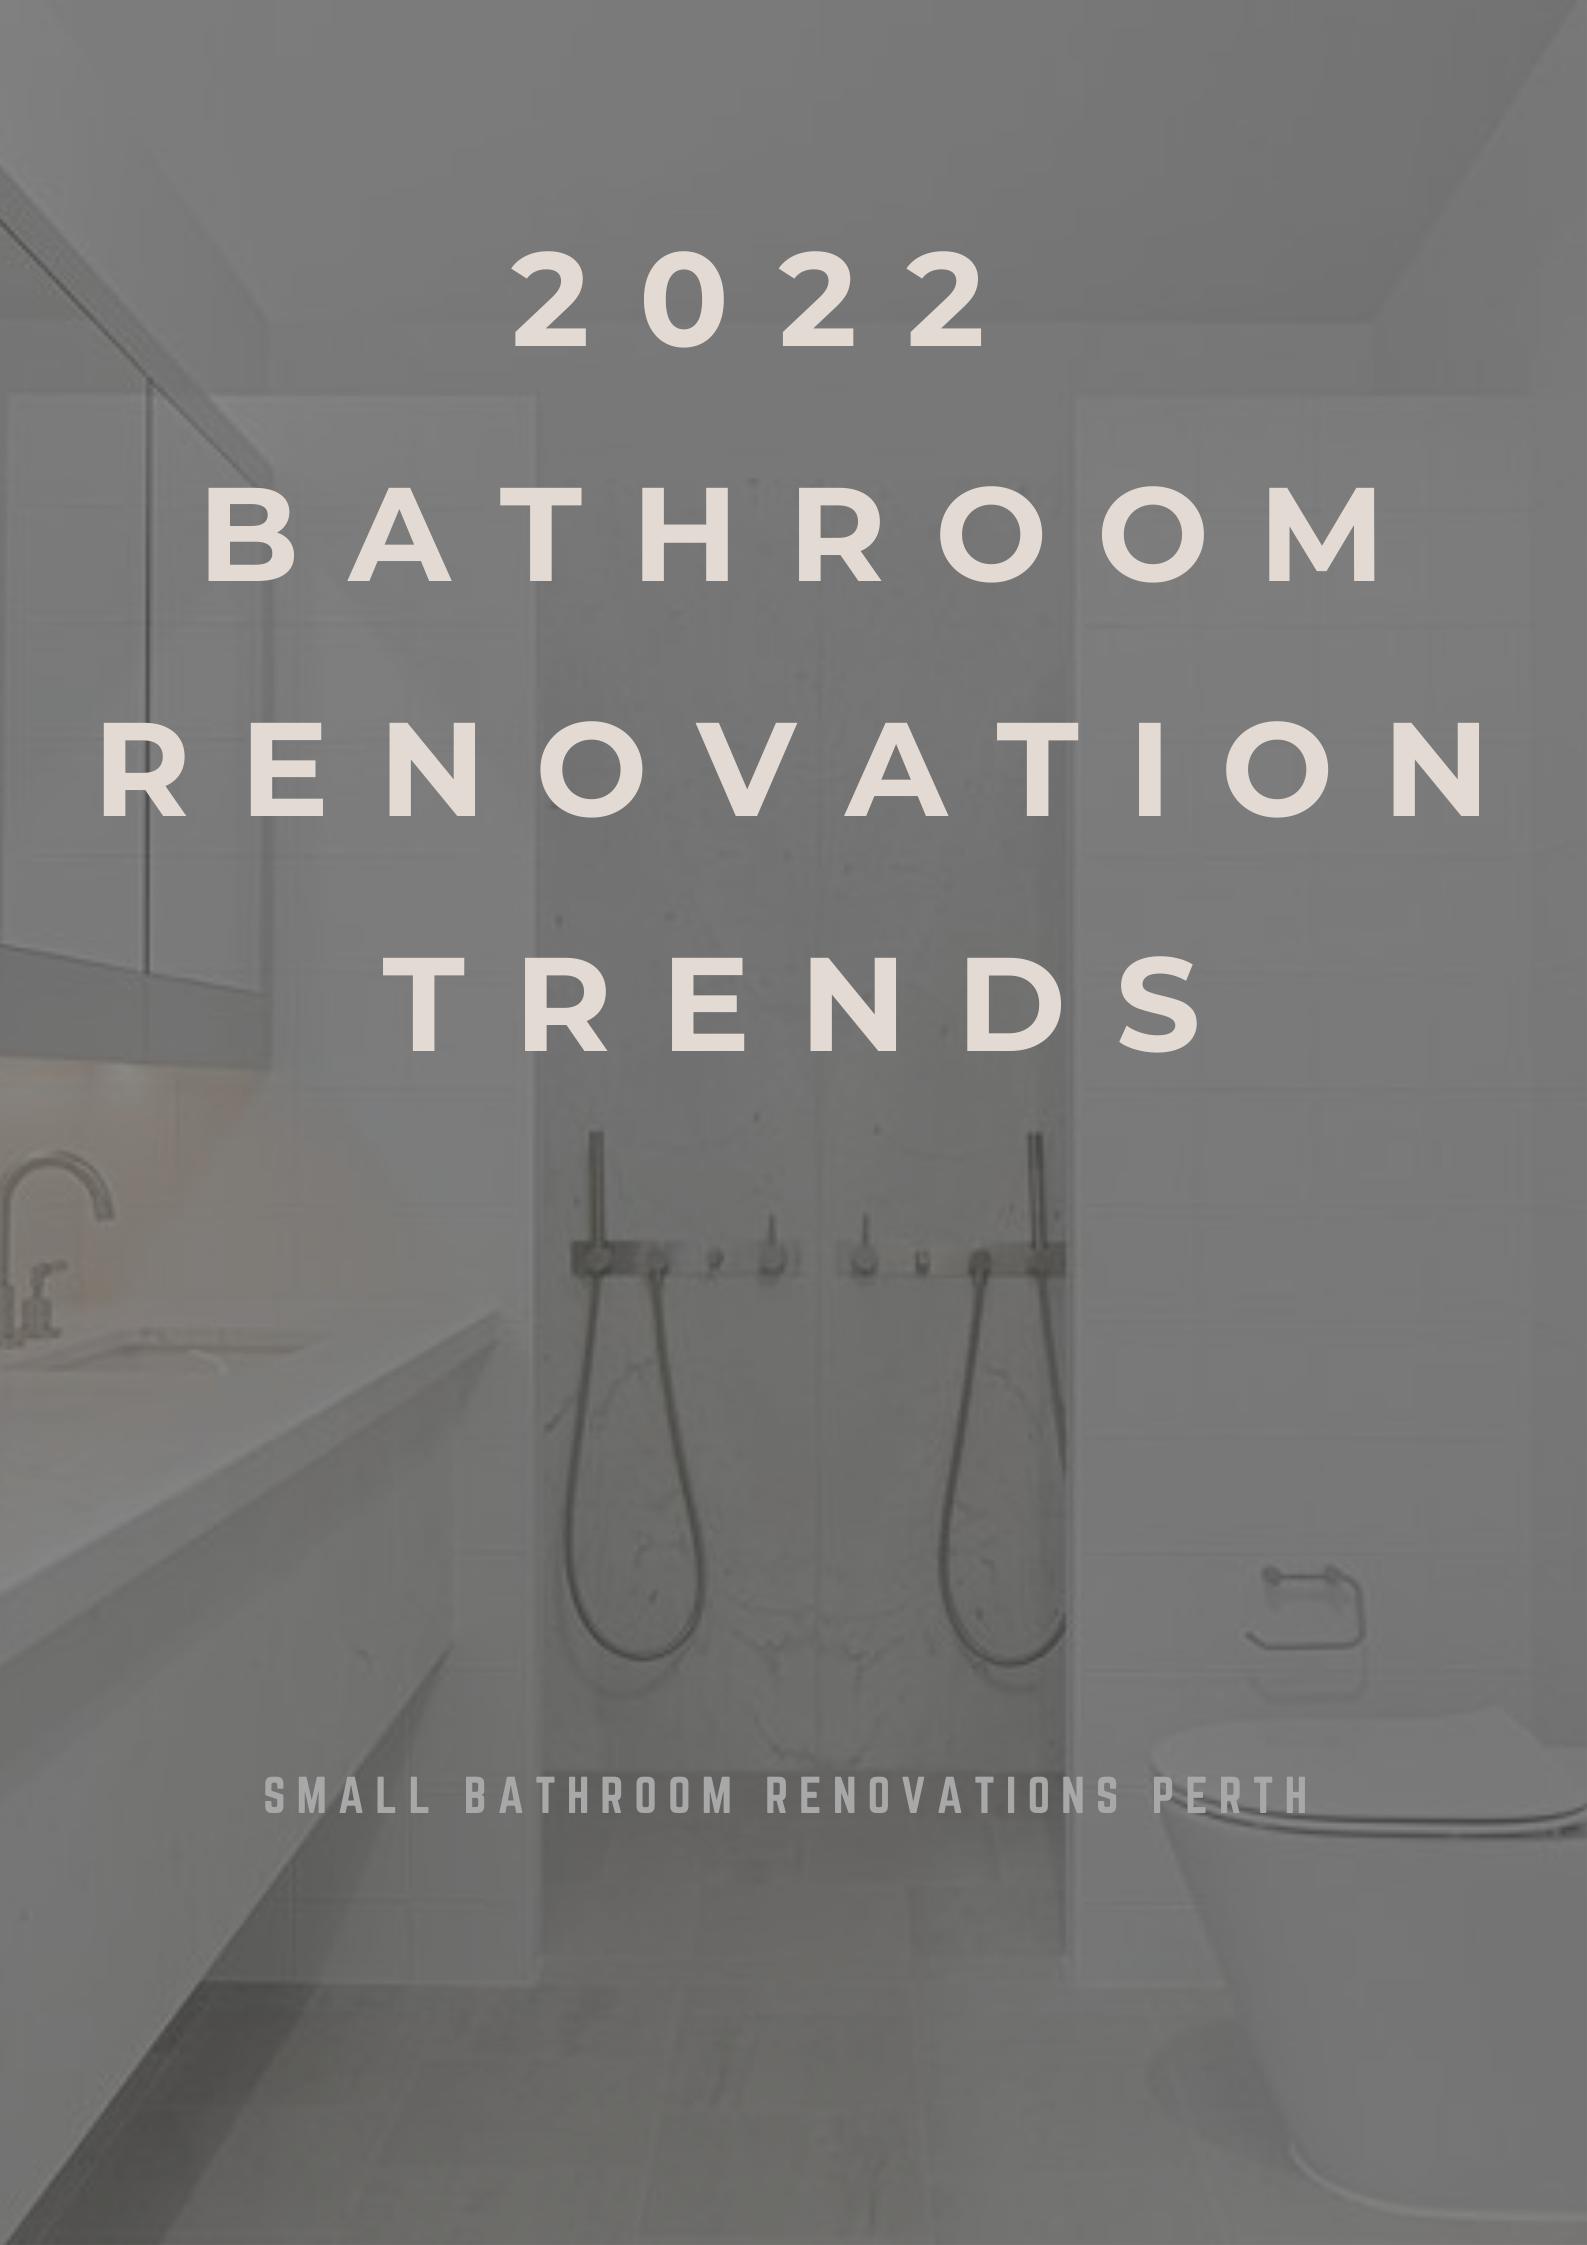 2022 Bathroom Renovation Trends